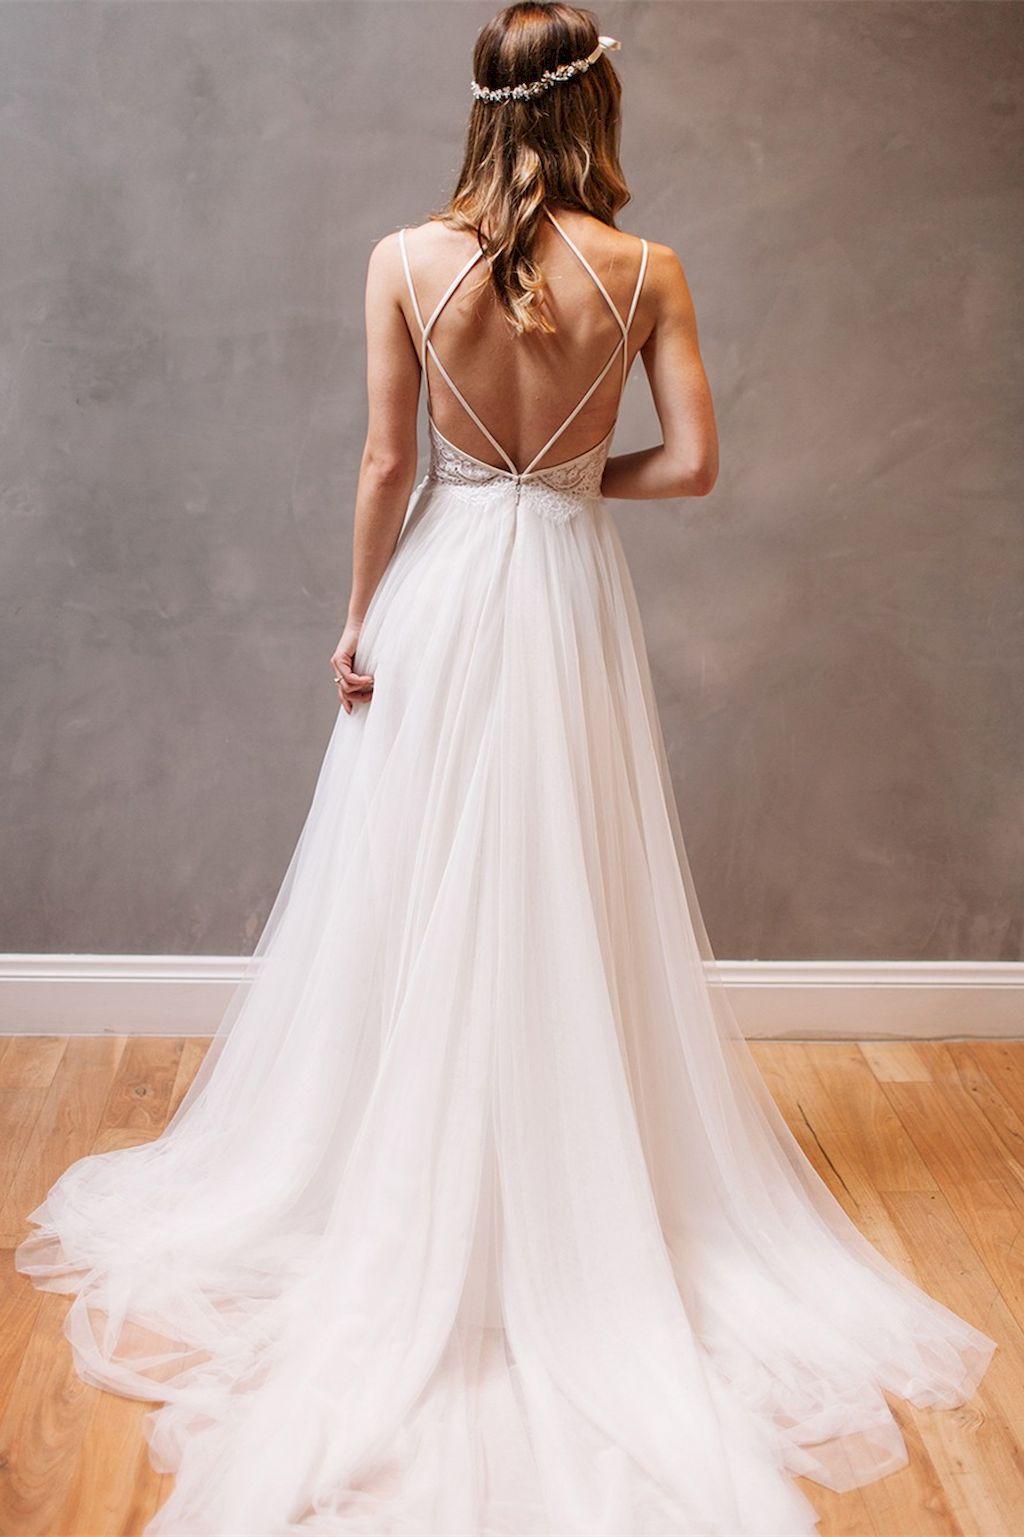 gorgeous backless wedding dresses design ideas the sapphire